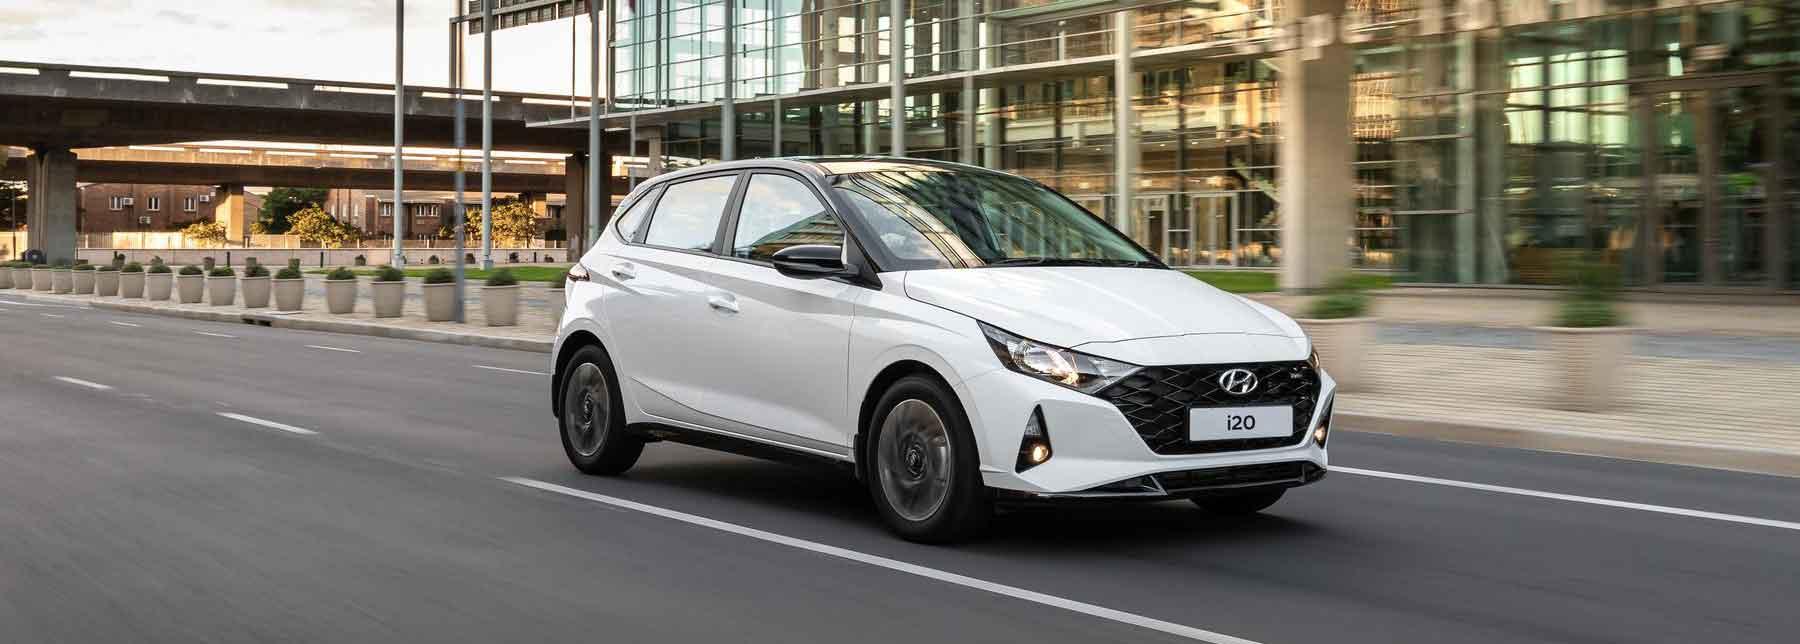 Hyundai i20 third generation launched